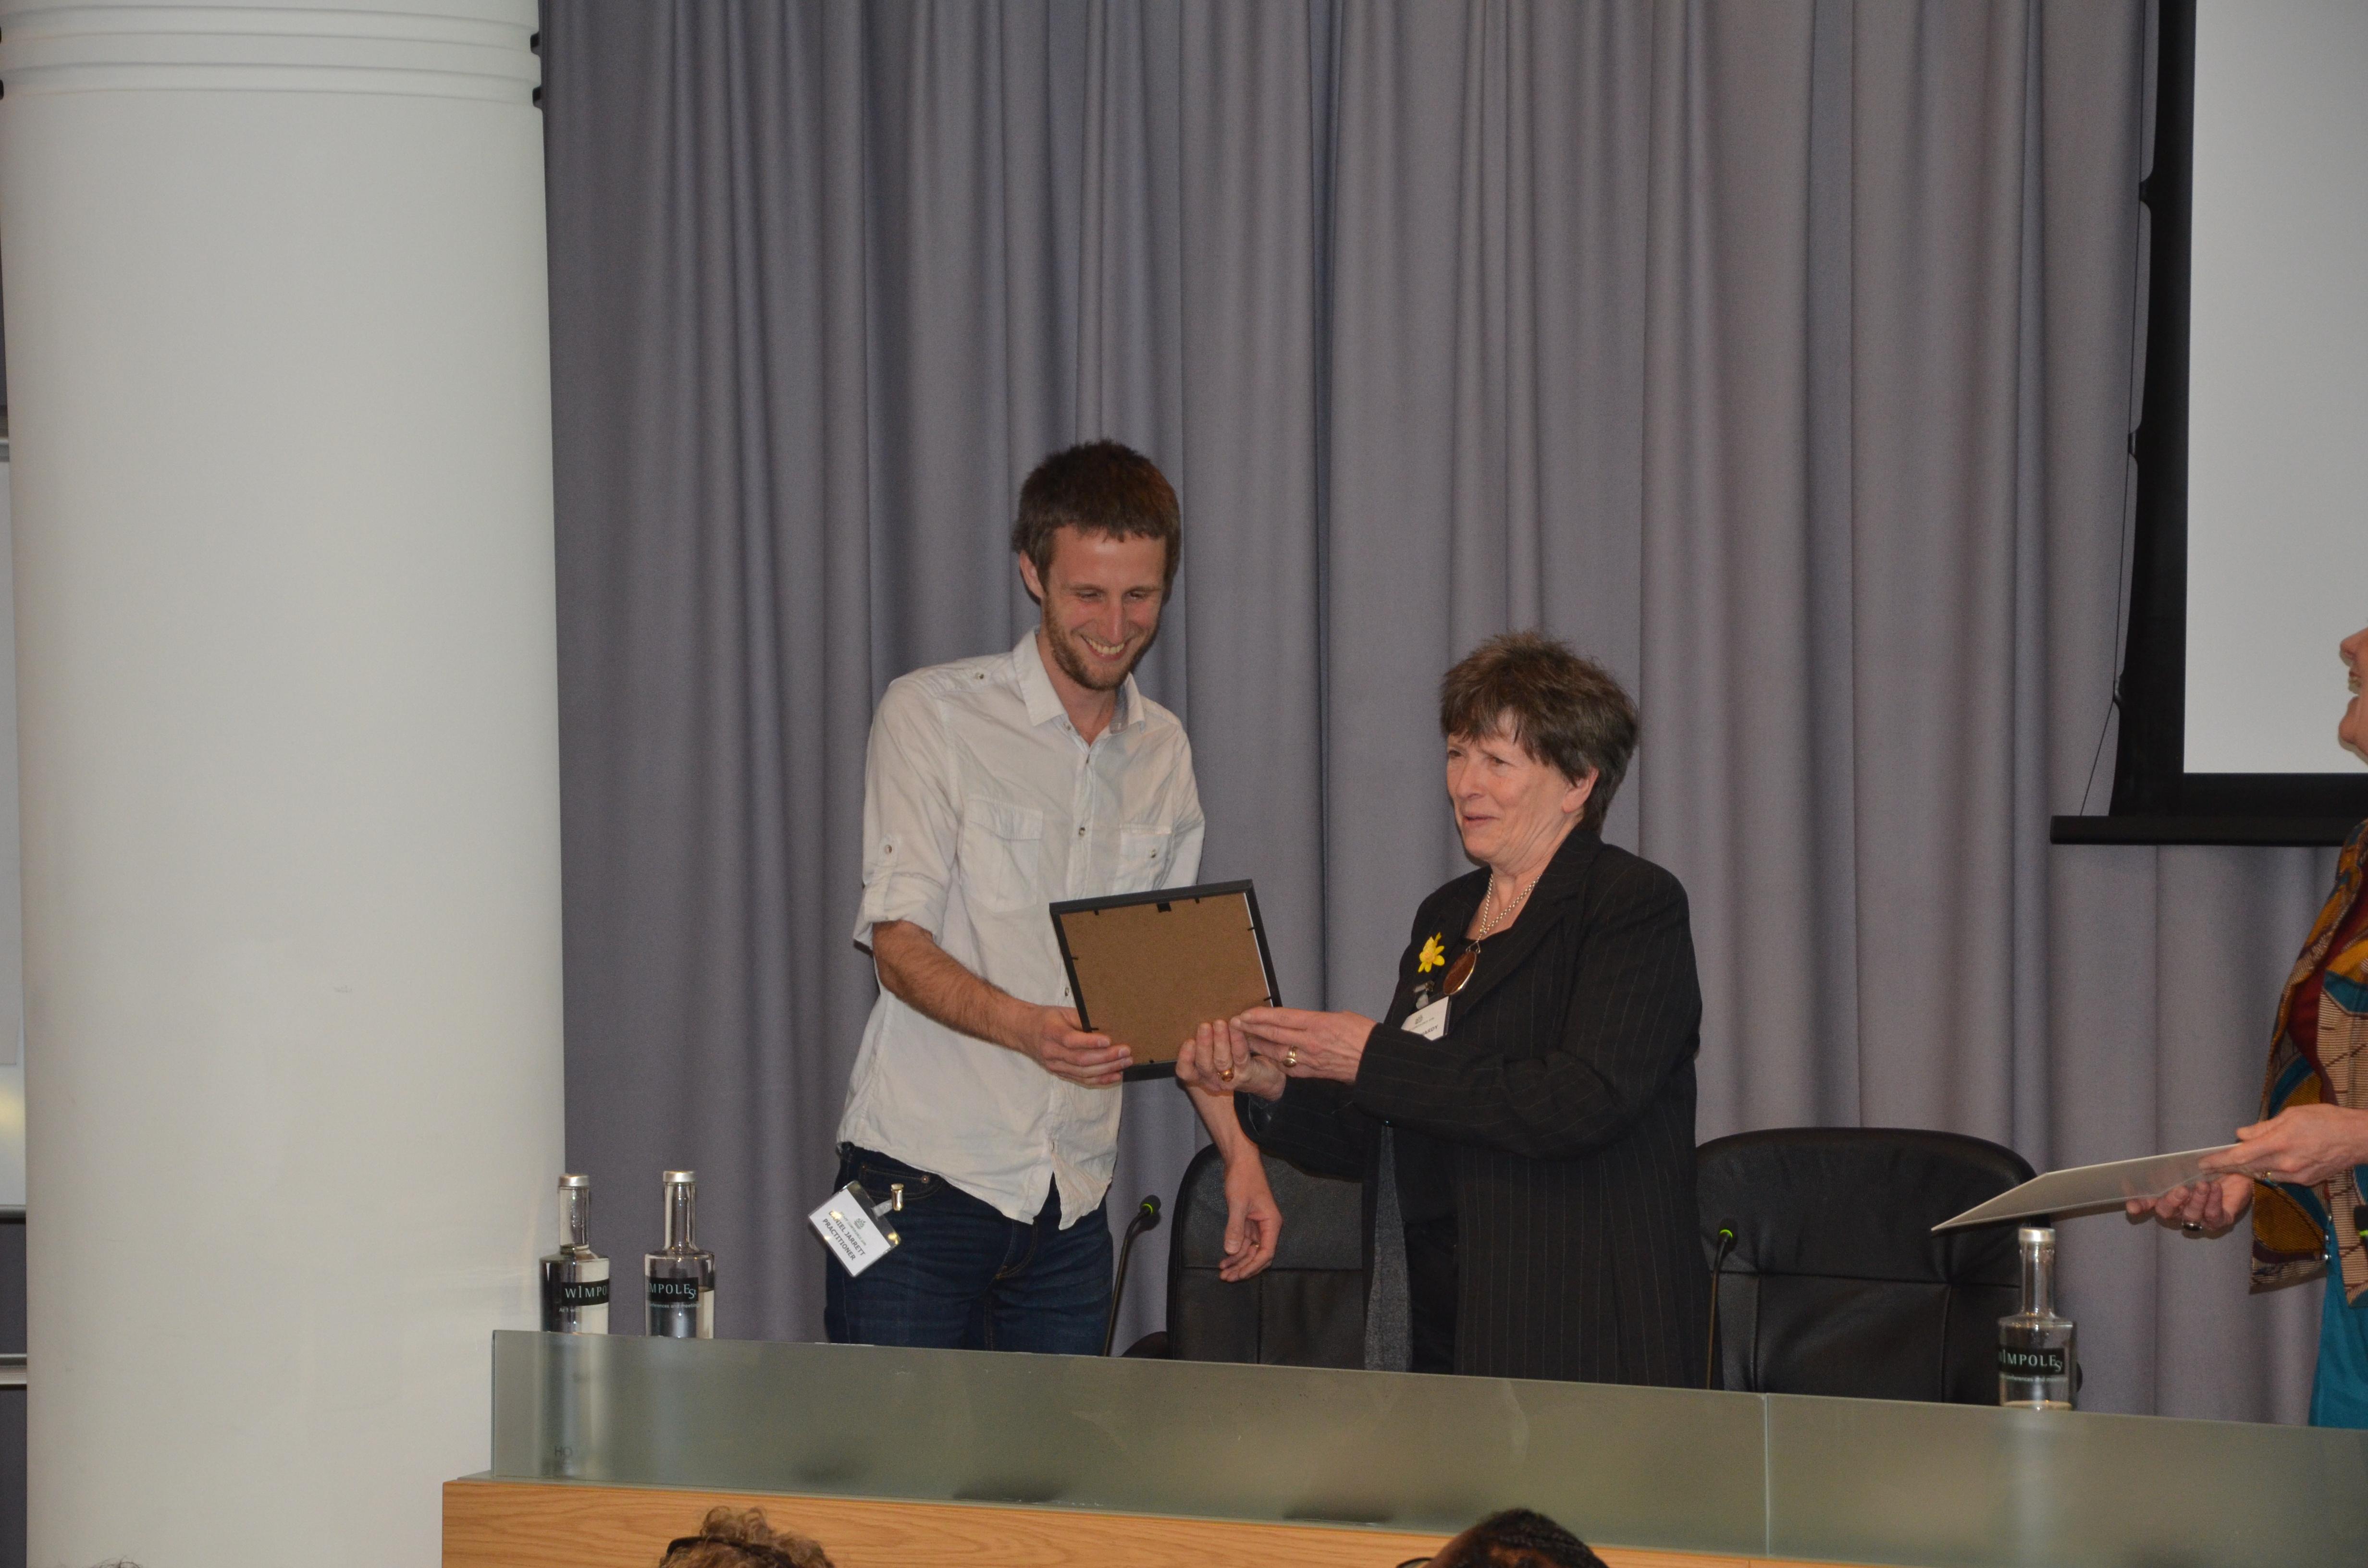 Daniel Jarrett and Anne McHardy with the award